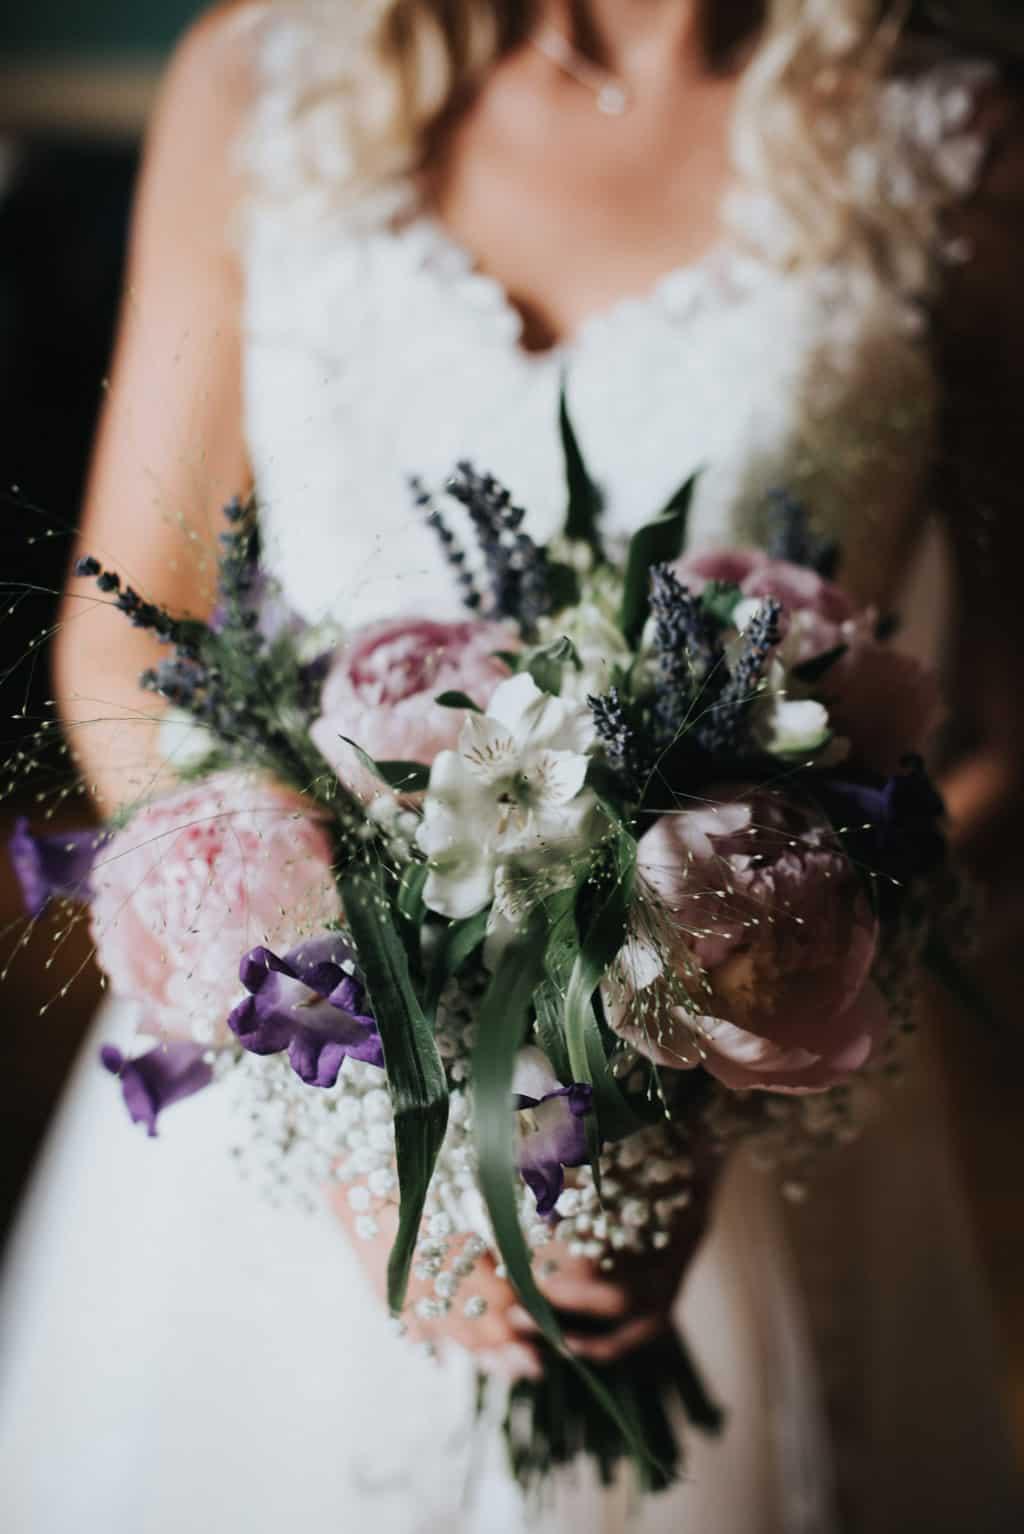 753 wedding photographer verona Da Monaco alla Valpolicella   matrimonio Villa Cariola